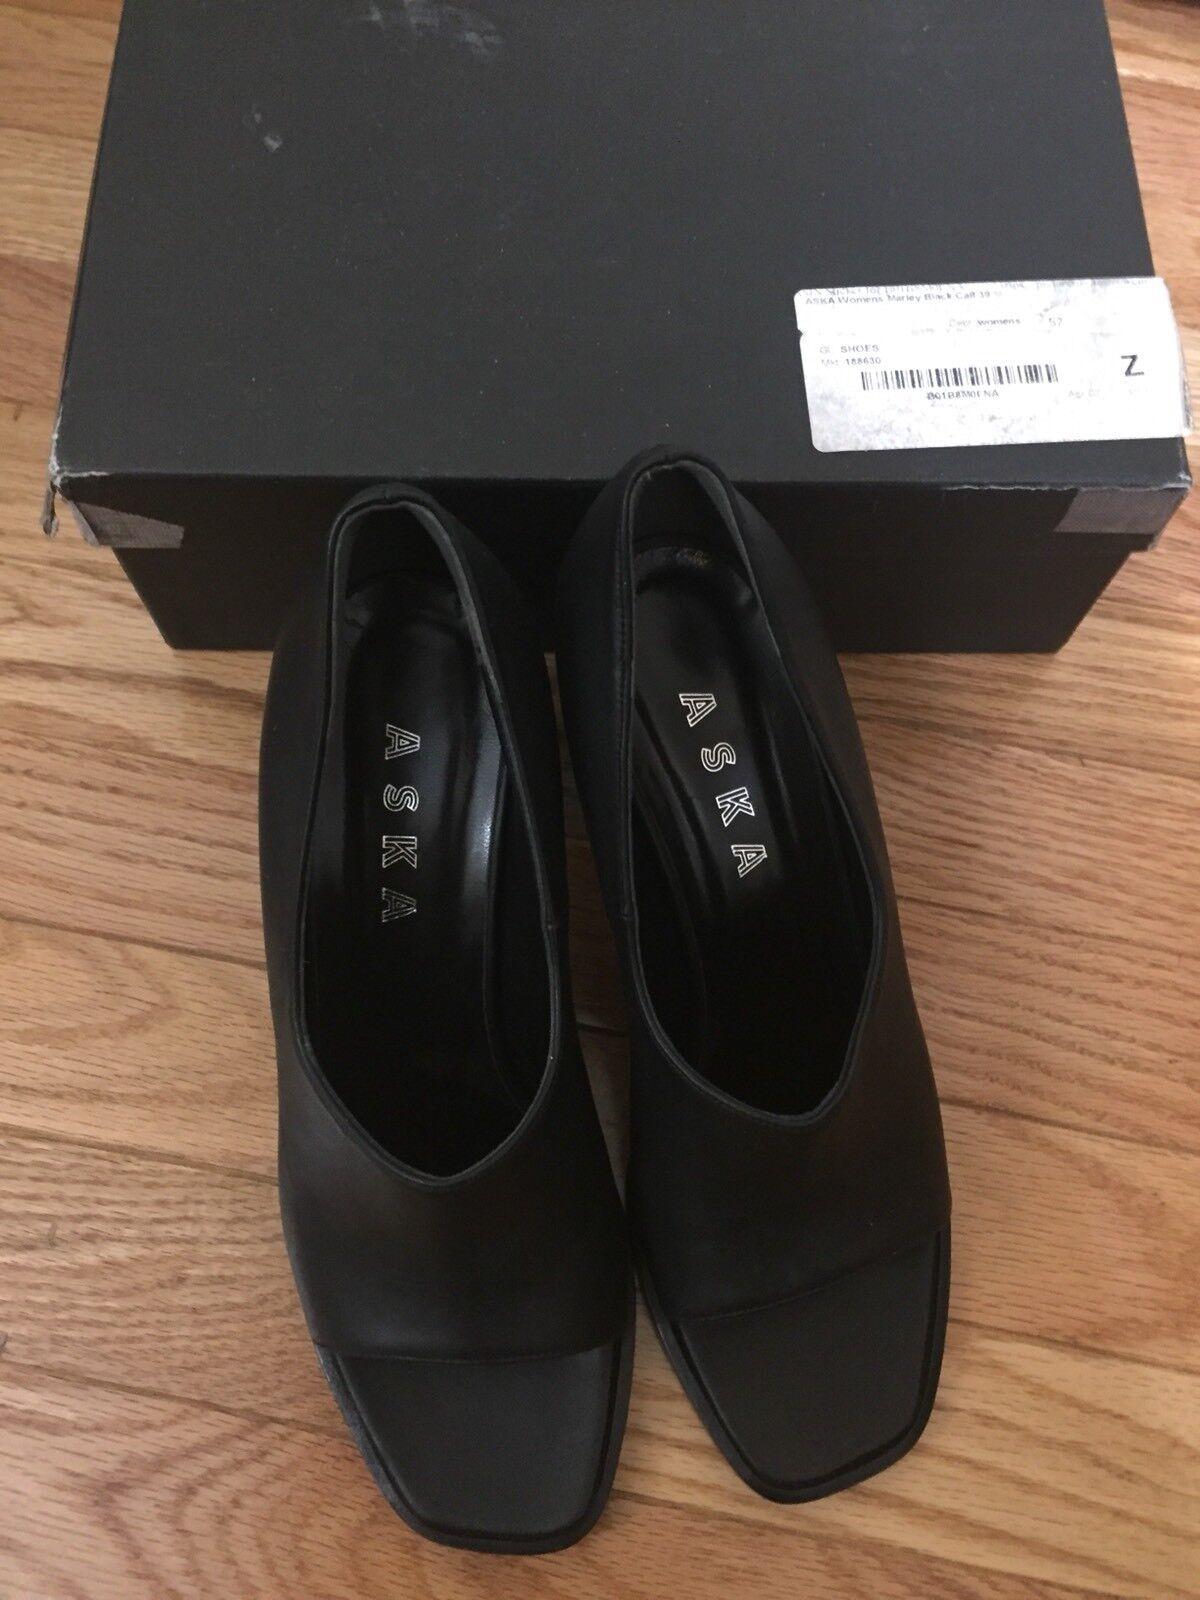 garanzia di qualità ASKA Marley nero Smooth Calf Block Heels Heels Heels Dimensione 39 -  305 Made in   acquista online